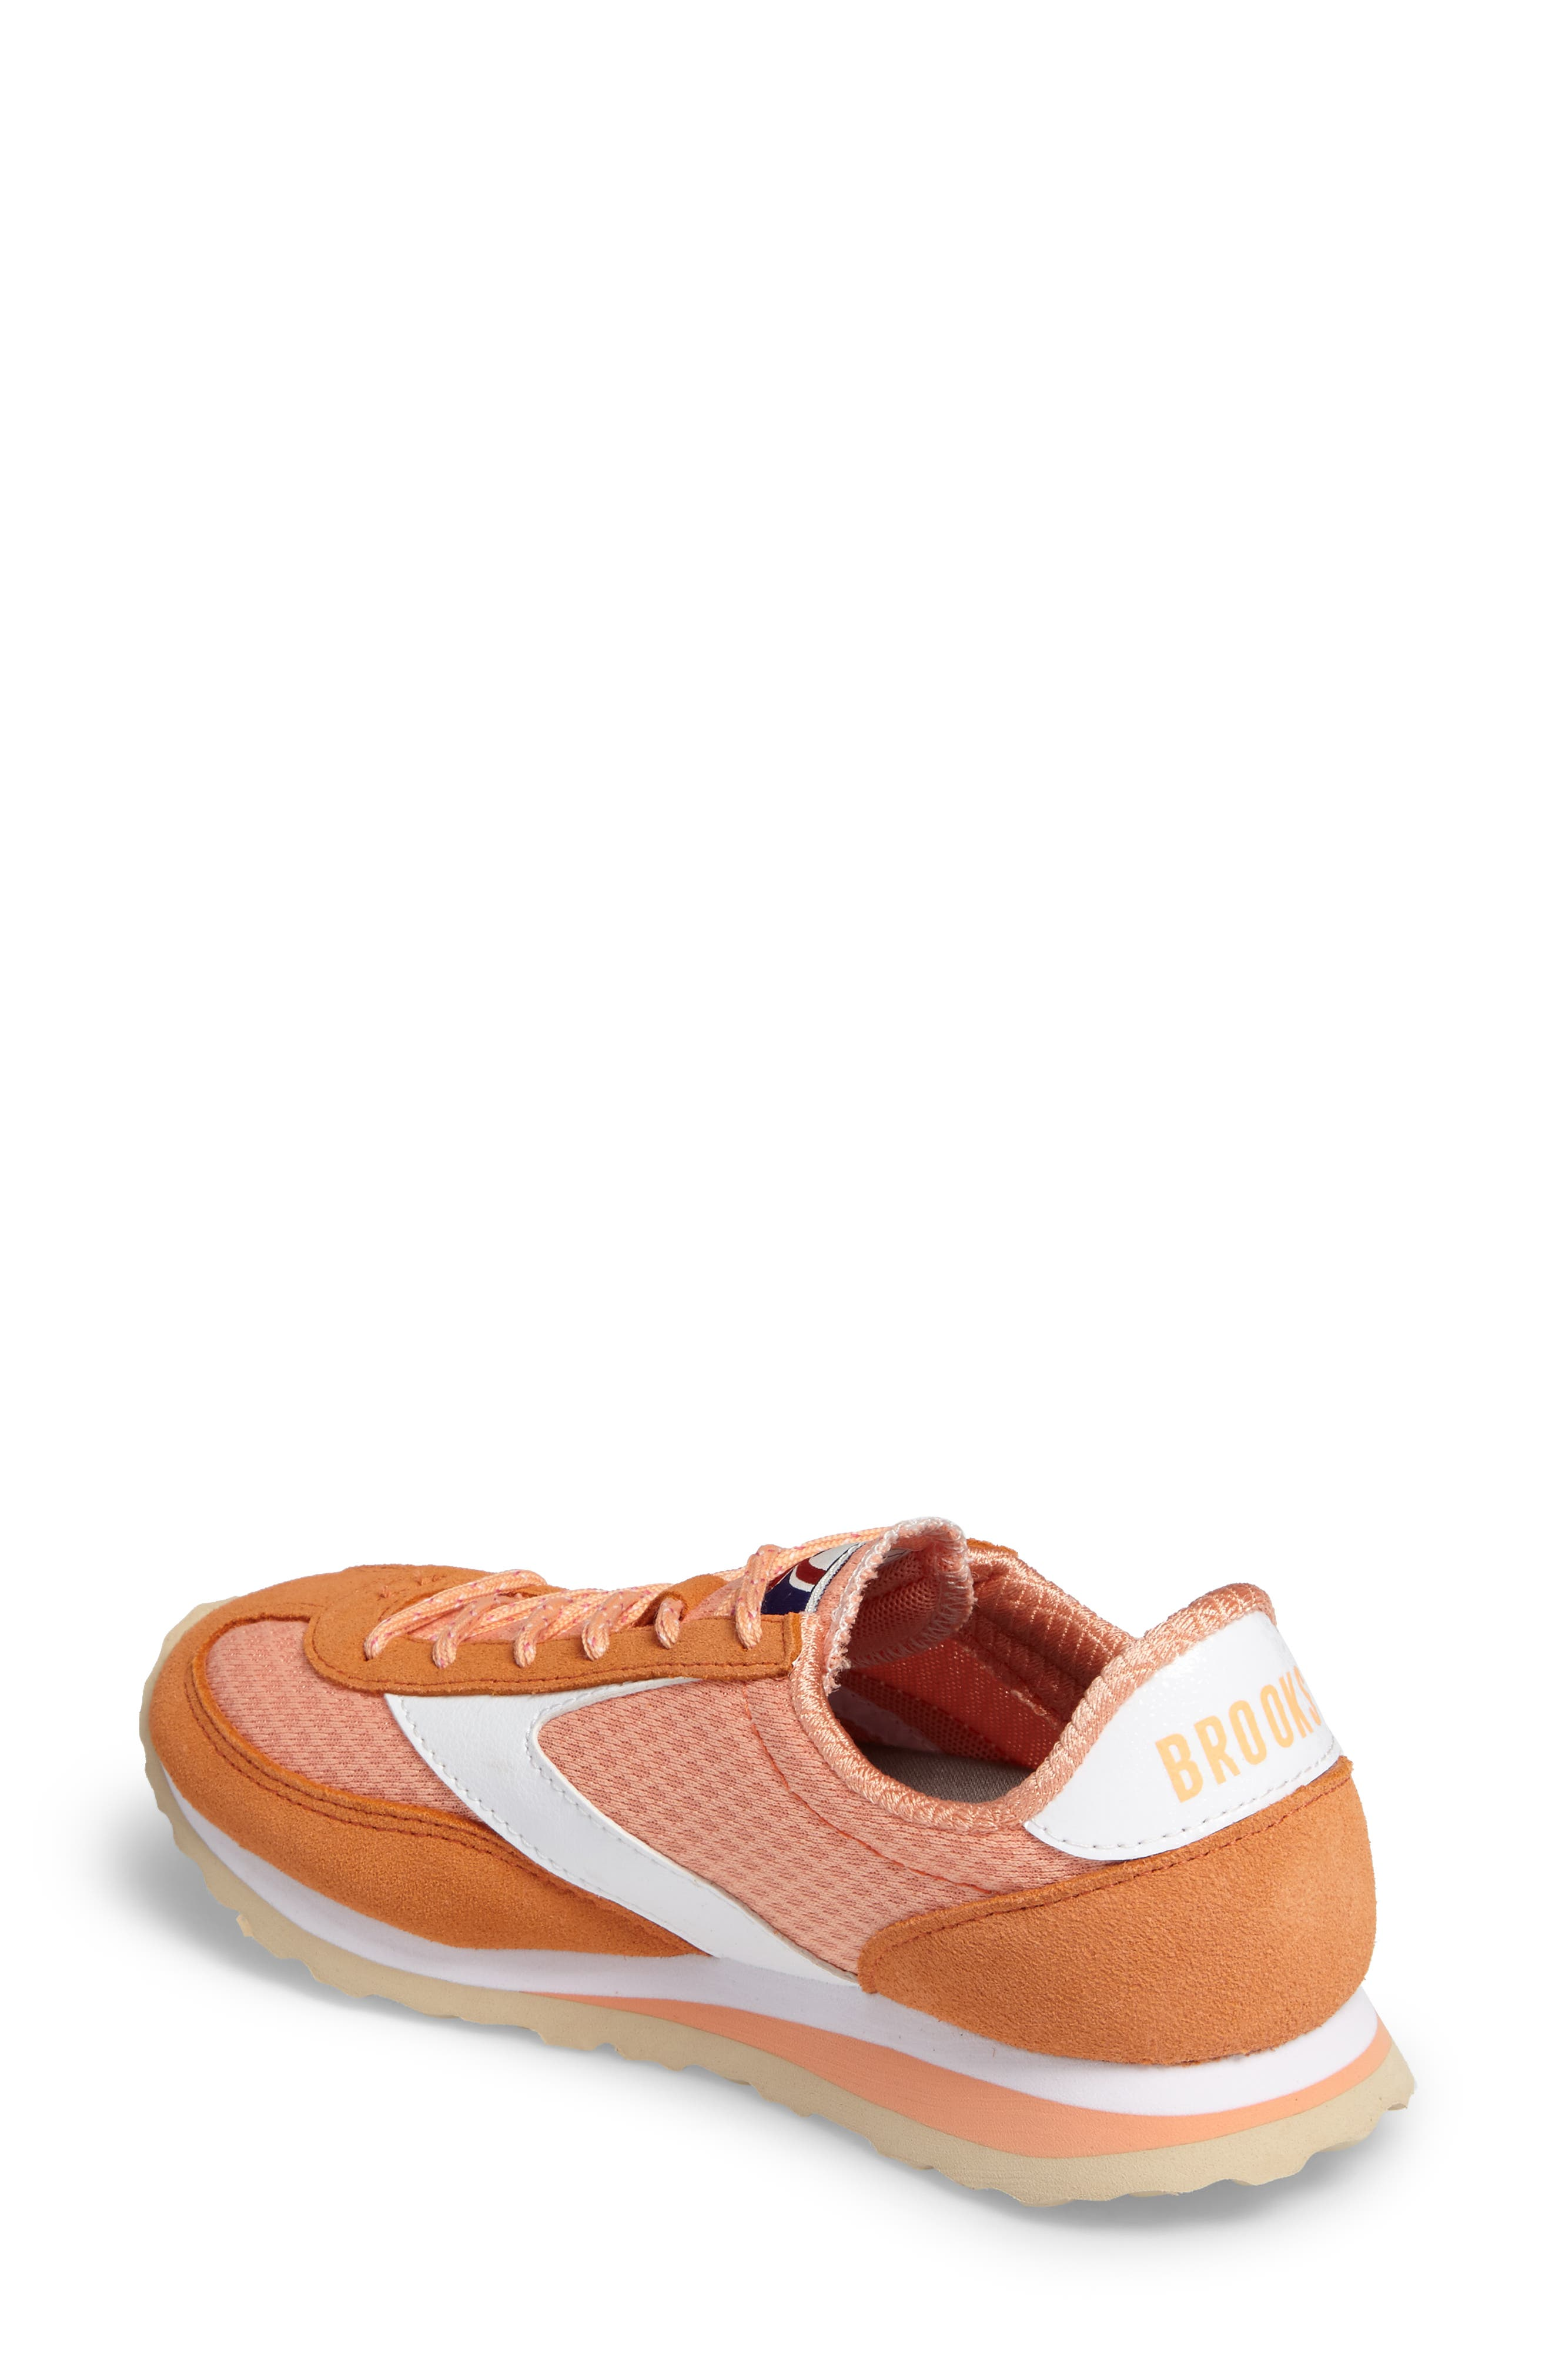 'Vanguard' Sneaker,                             Alternate thumbnail 50, color,